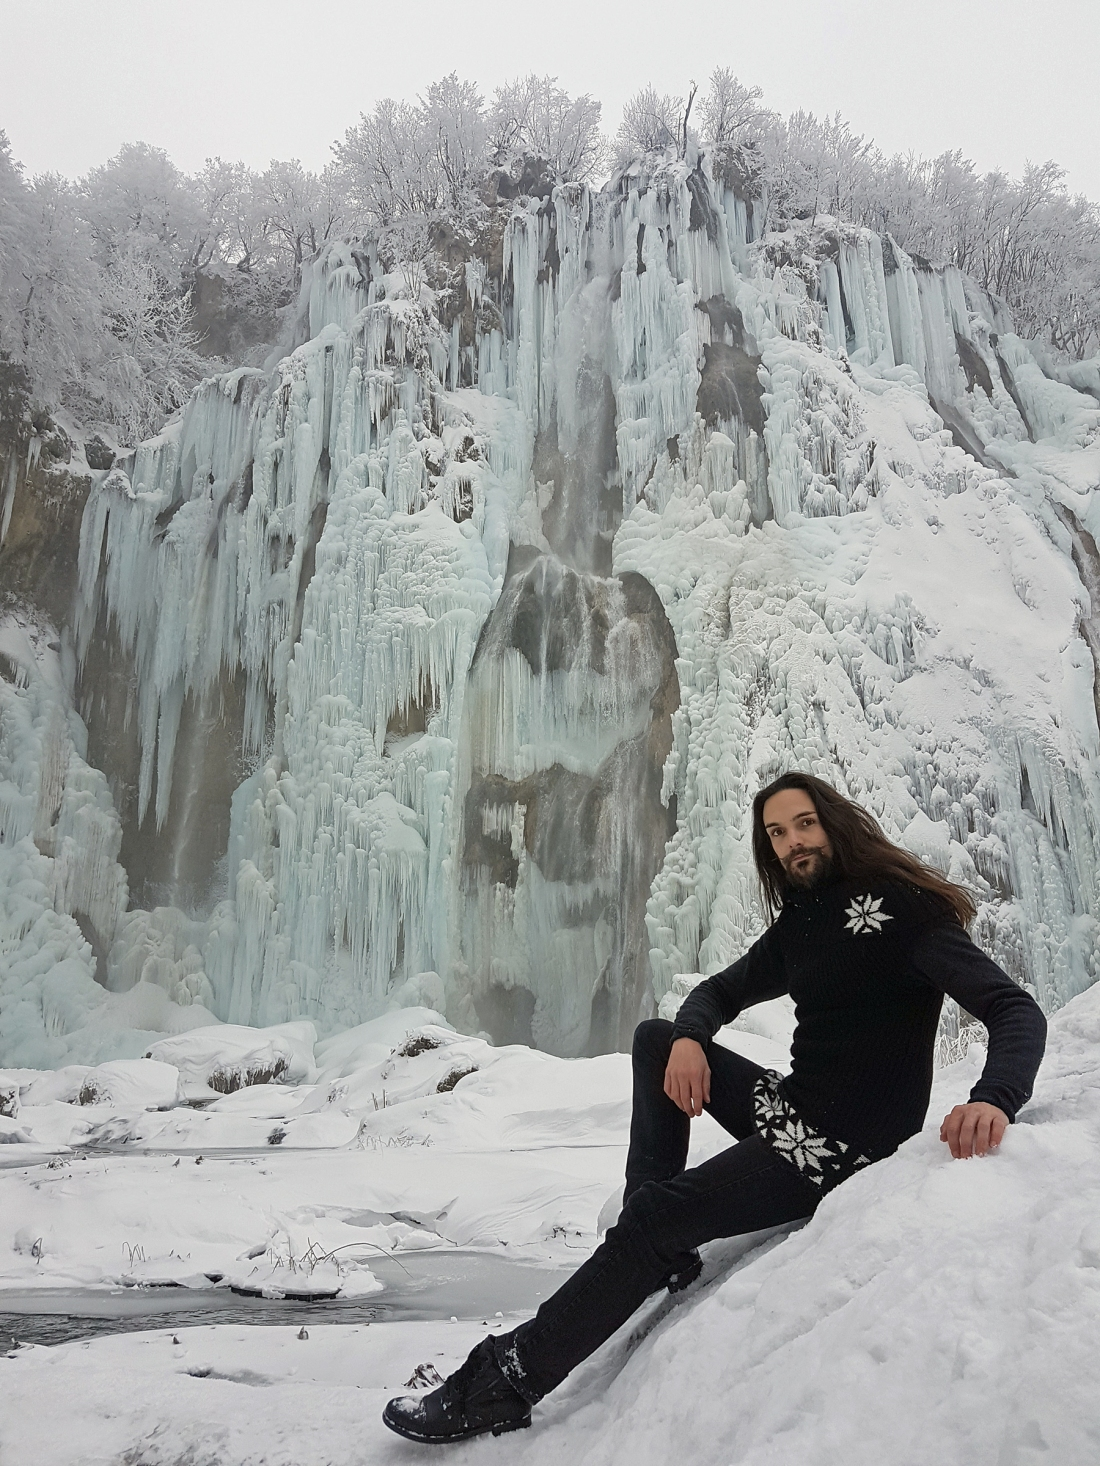 lacs plitvice croatia winter telombre